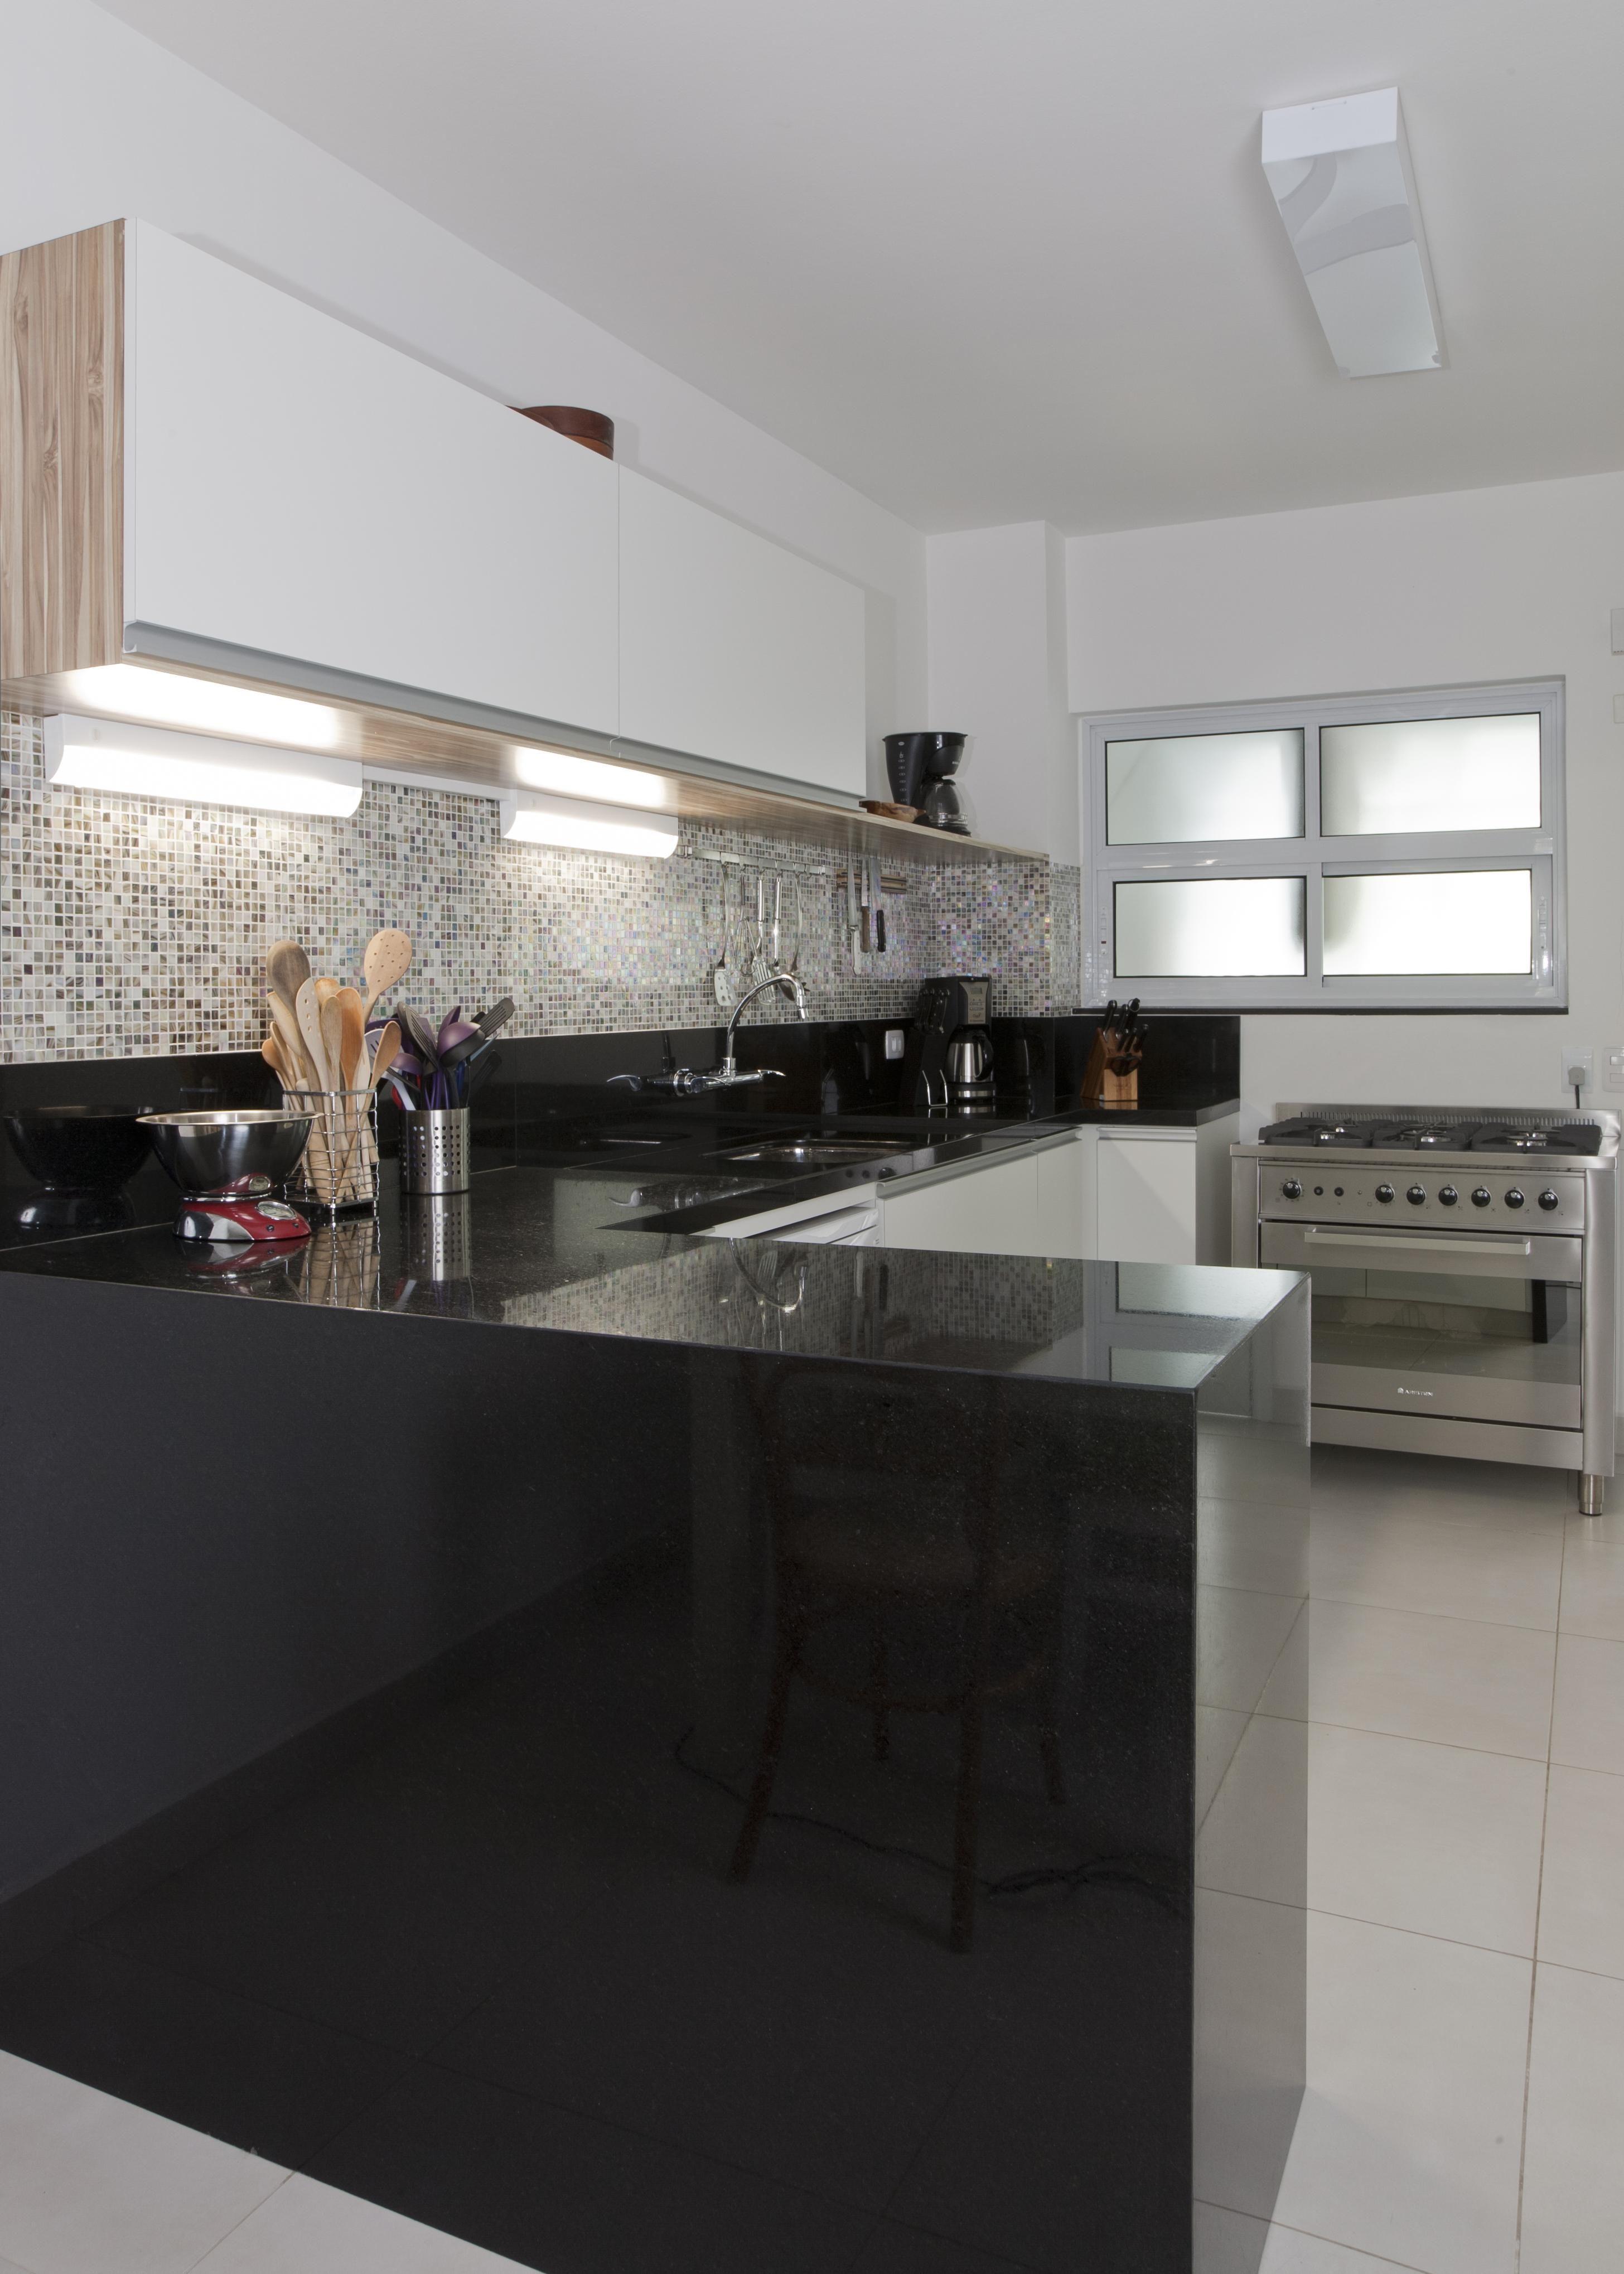 14436 cozinha cozinha adell e porto viva decora #5D4B44 2912 4077